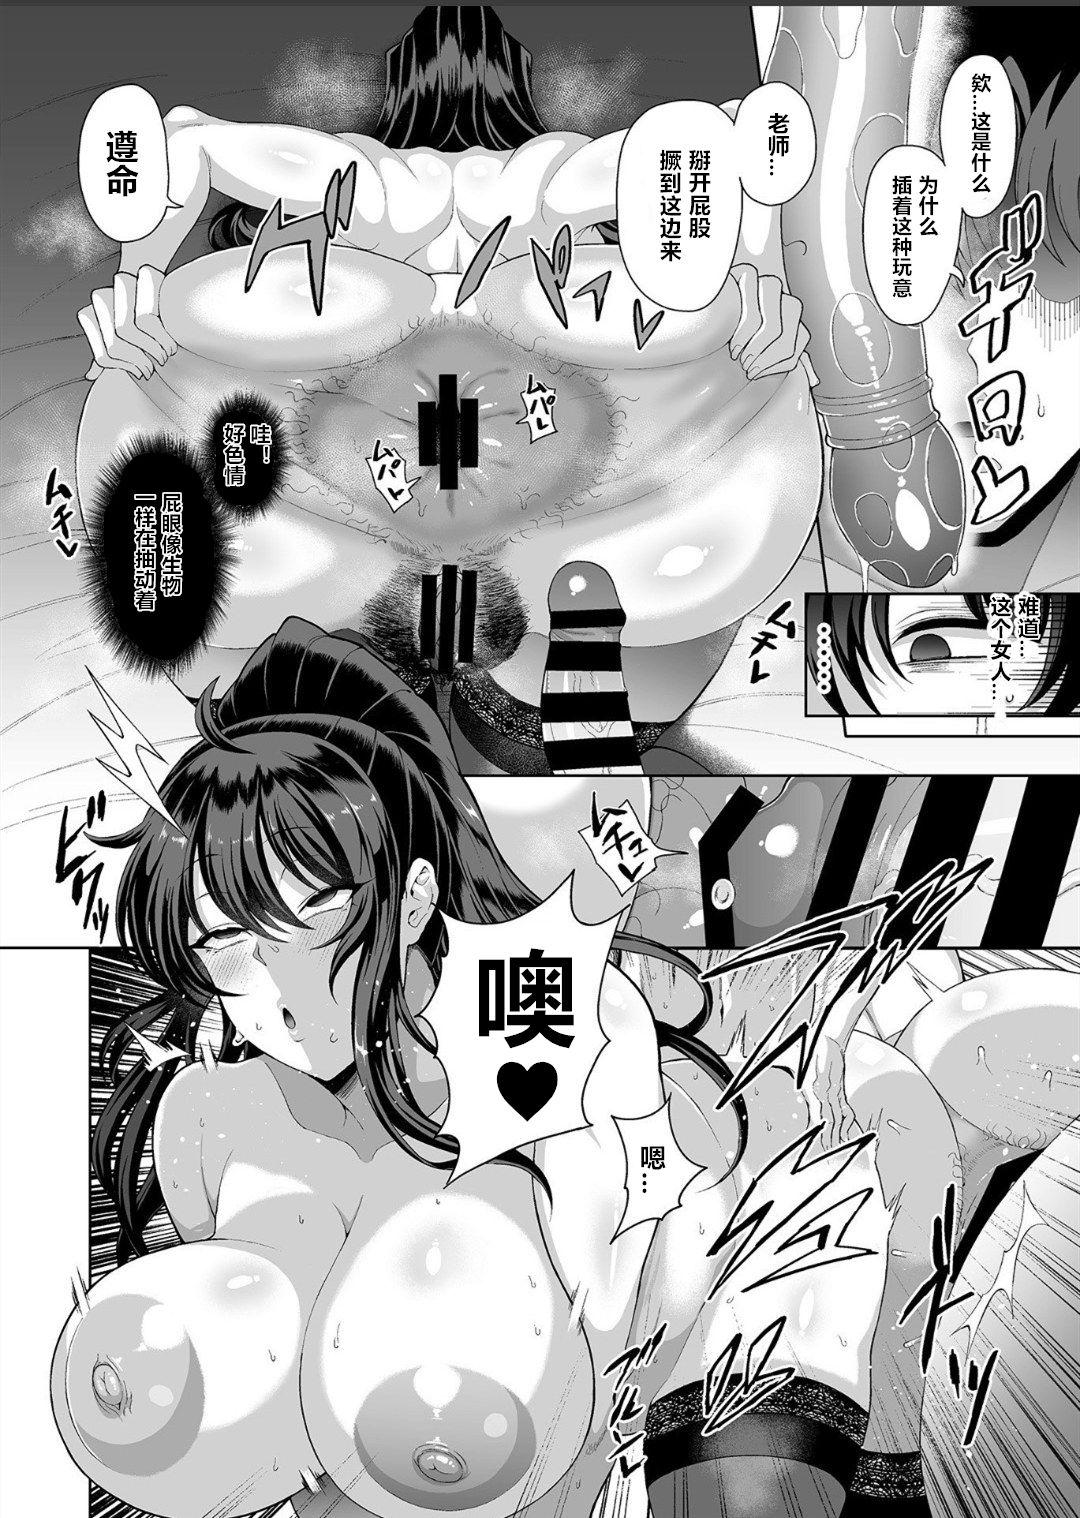 [Tawara Hiryuu] Saimin Seikatsu [sonobe ayako hen] (Chinese)【心海汉化组】 13